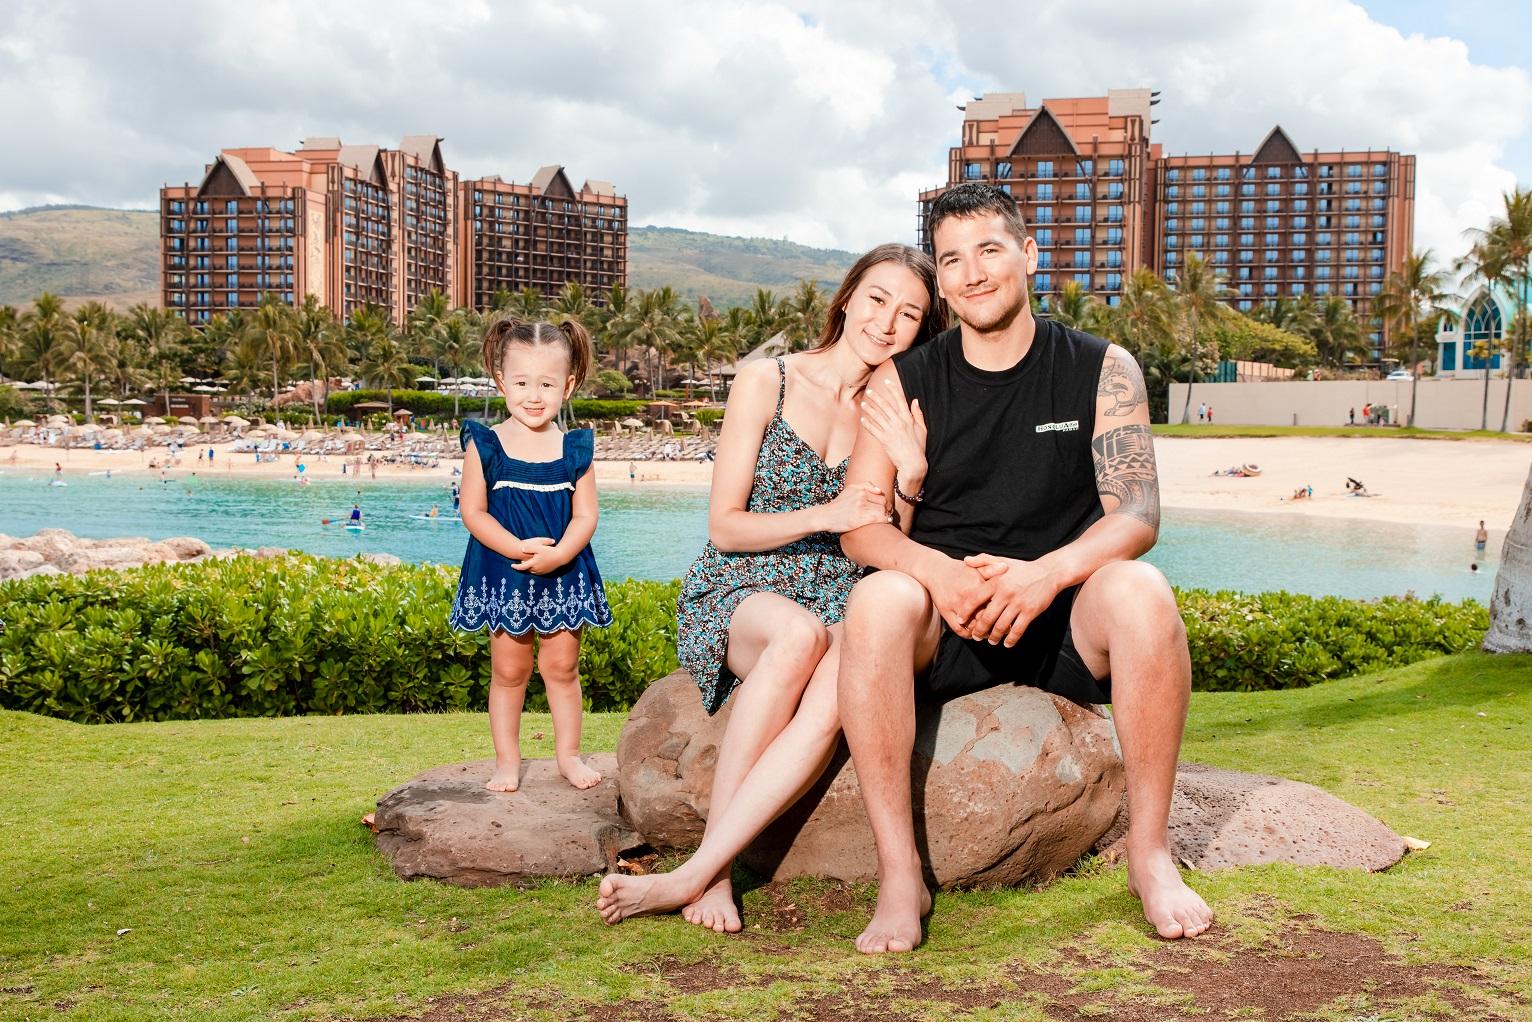 four seasons resort family portrait photography ko olina oahu hawaii